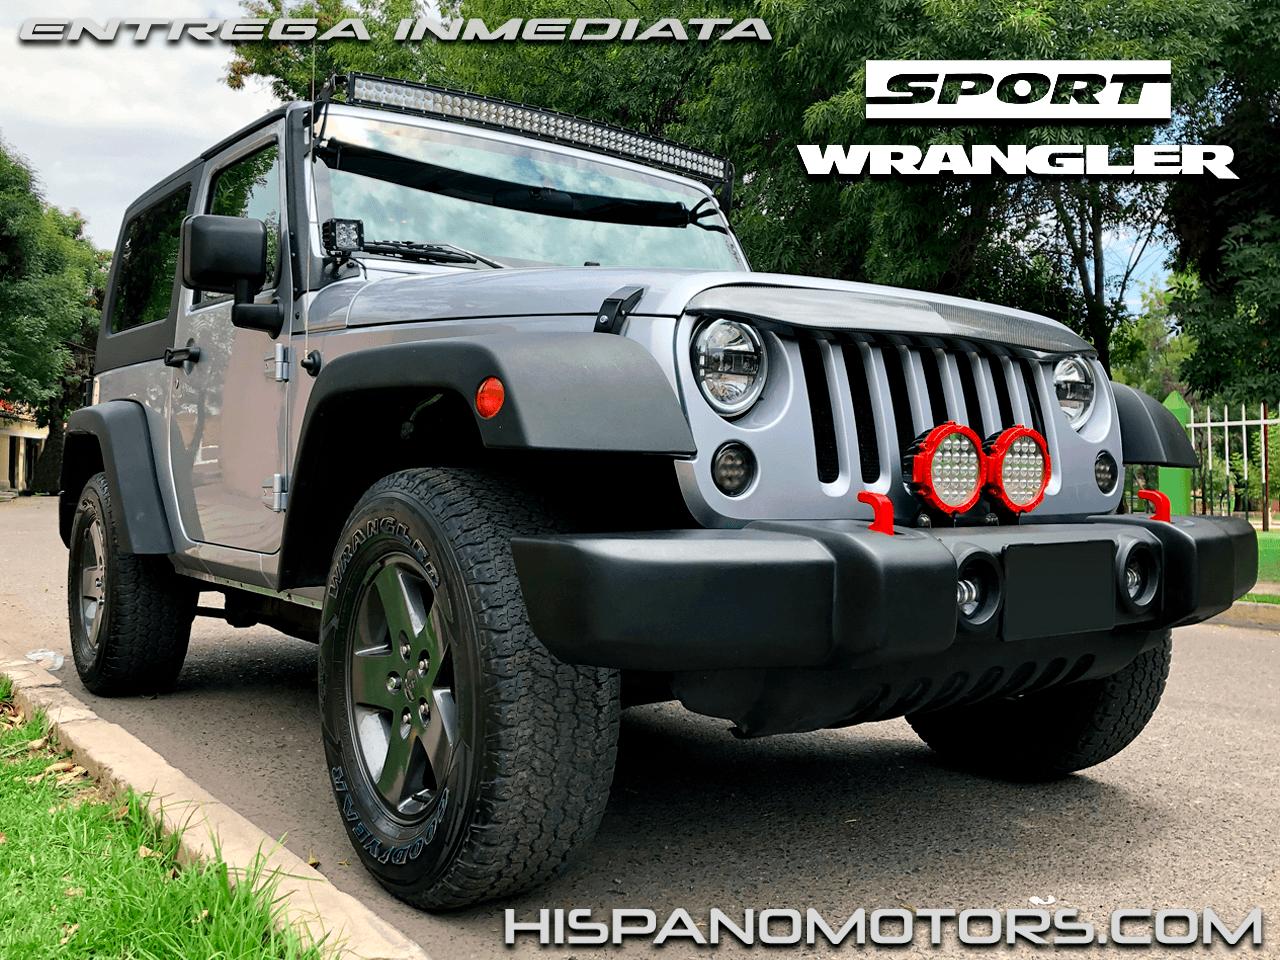 2013 JEEP WRANGLER SPORT S  MANUAL - Arequipa - Perú - auto importado por Hispanomotors